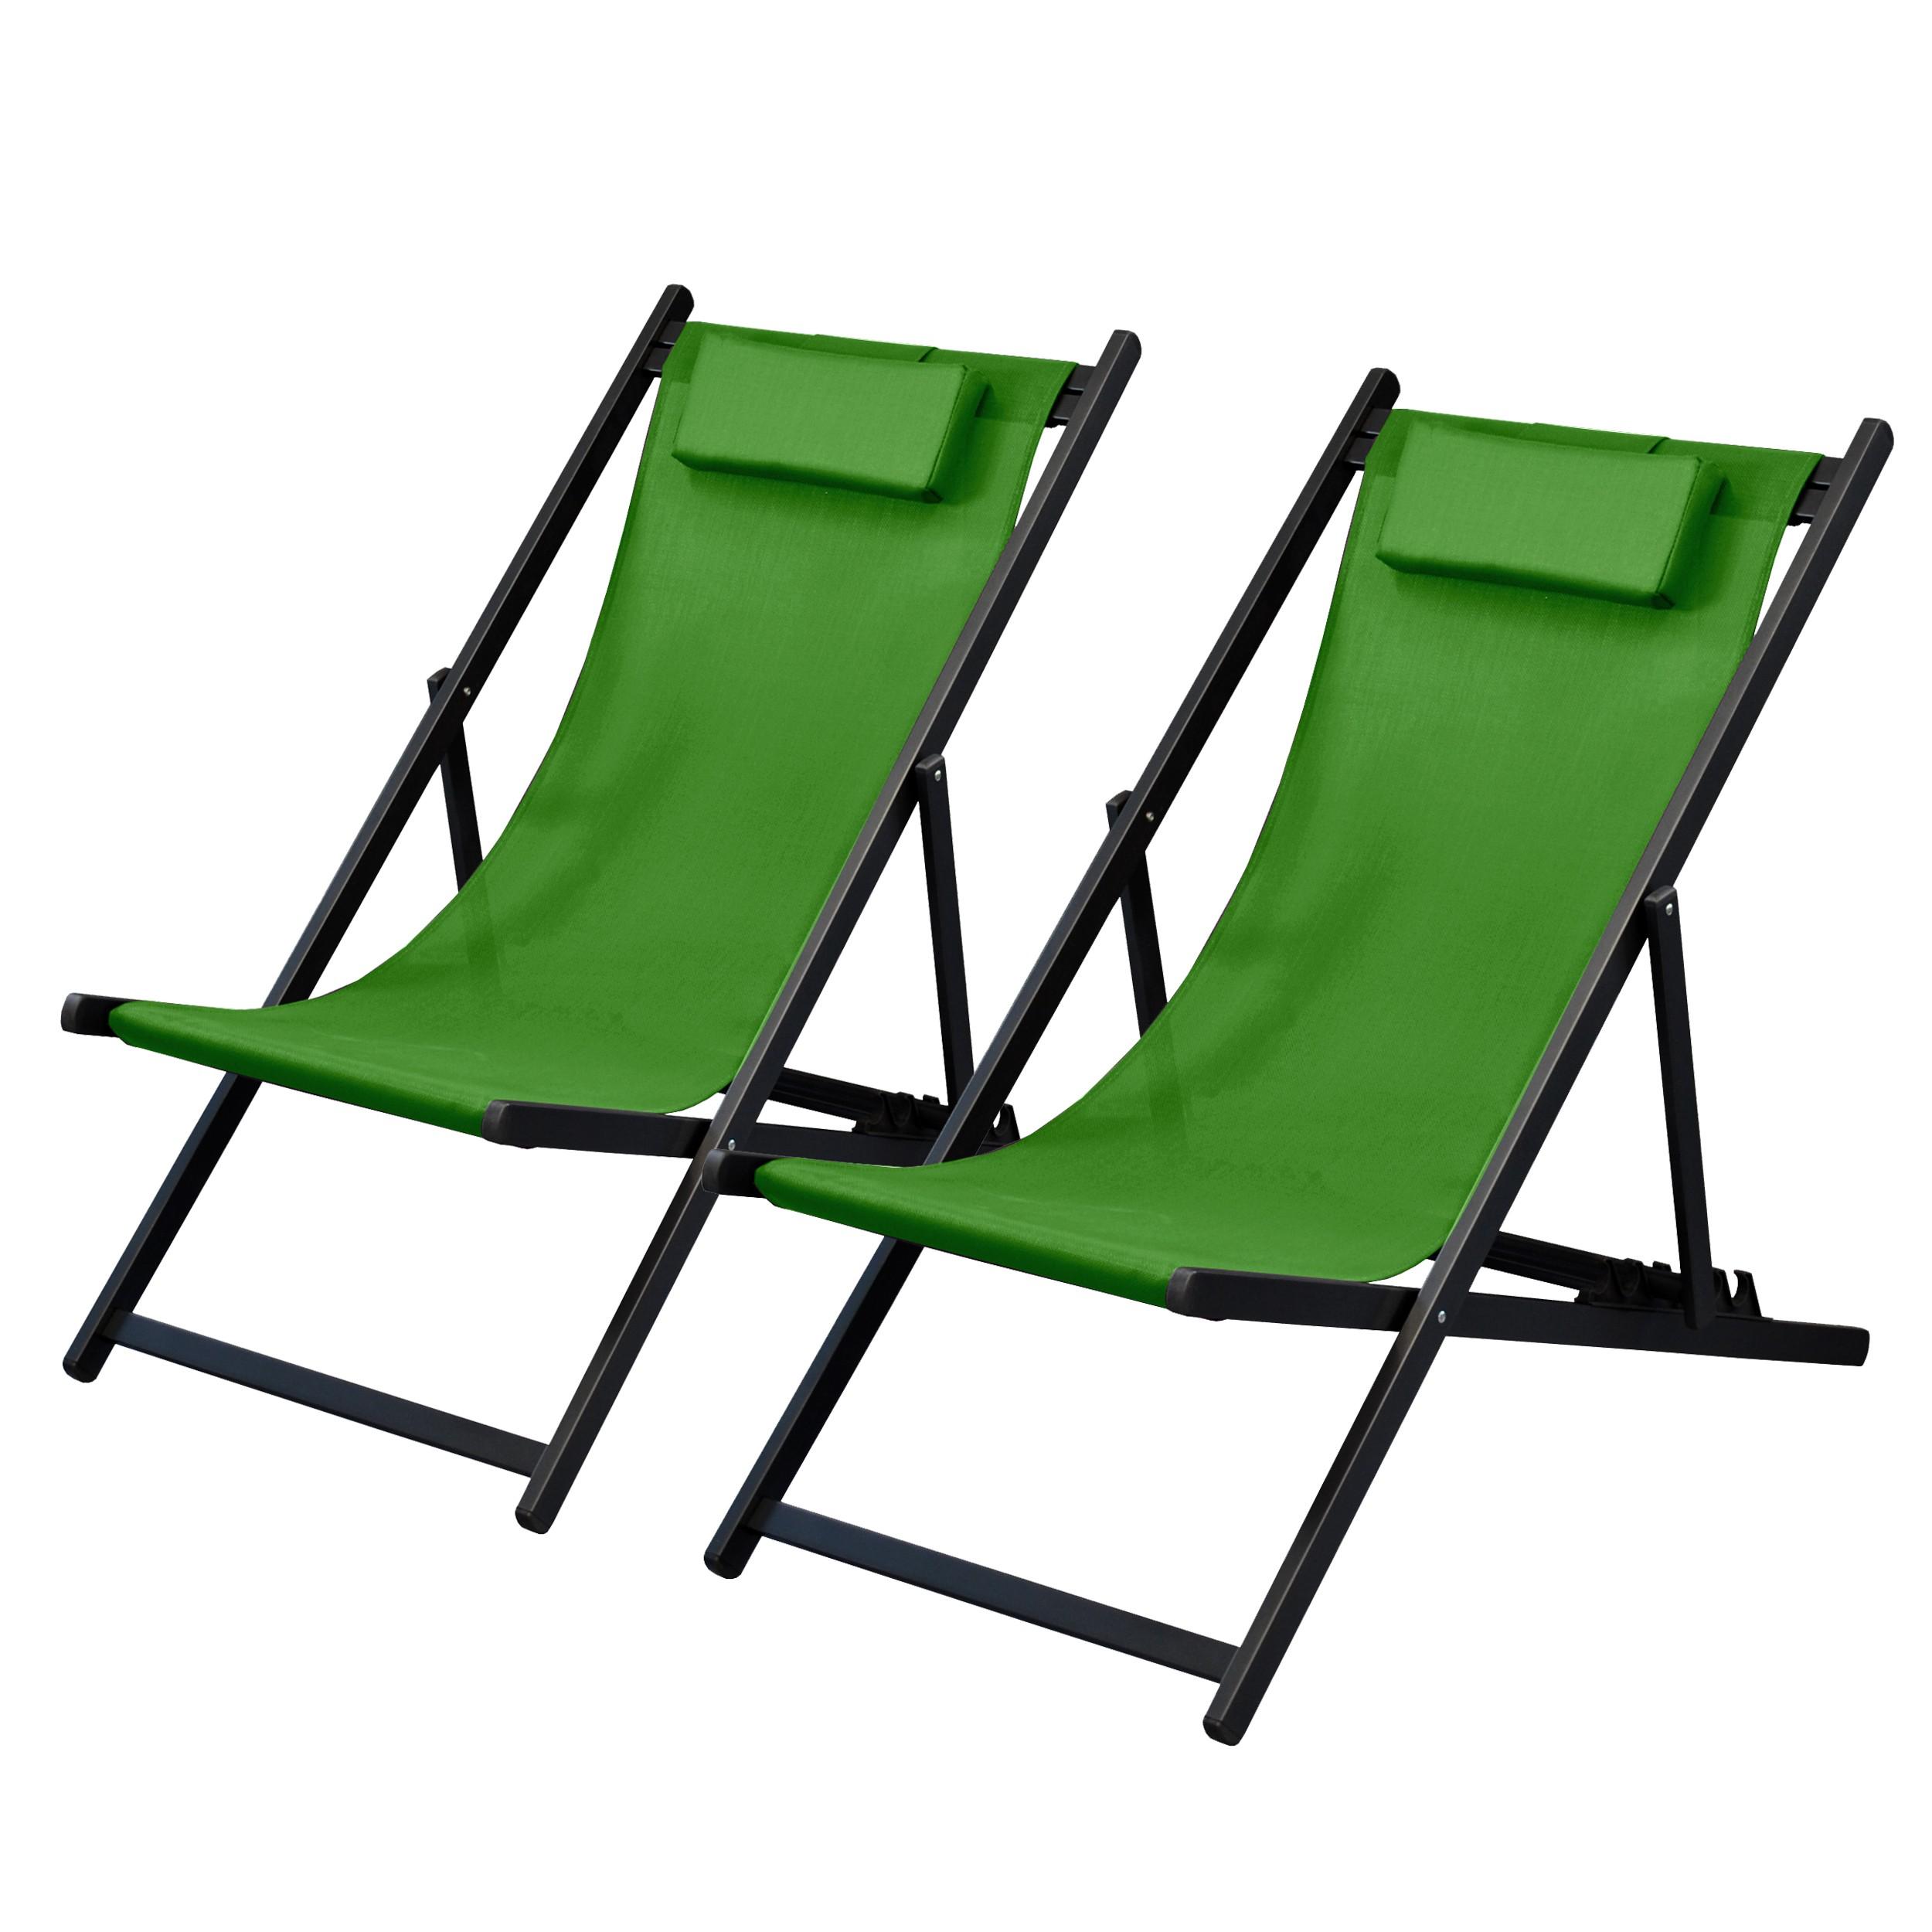 acheter des chaises free ou acheter chaise eames chaise. Black Bedroom Furniture Sets. Home Design Ideas